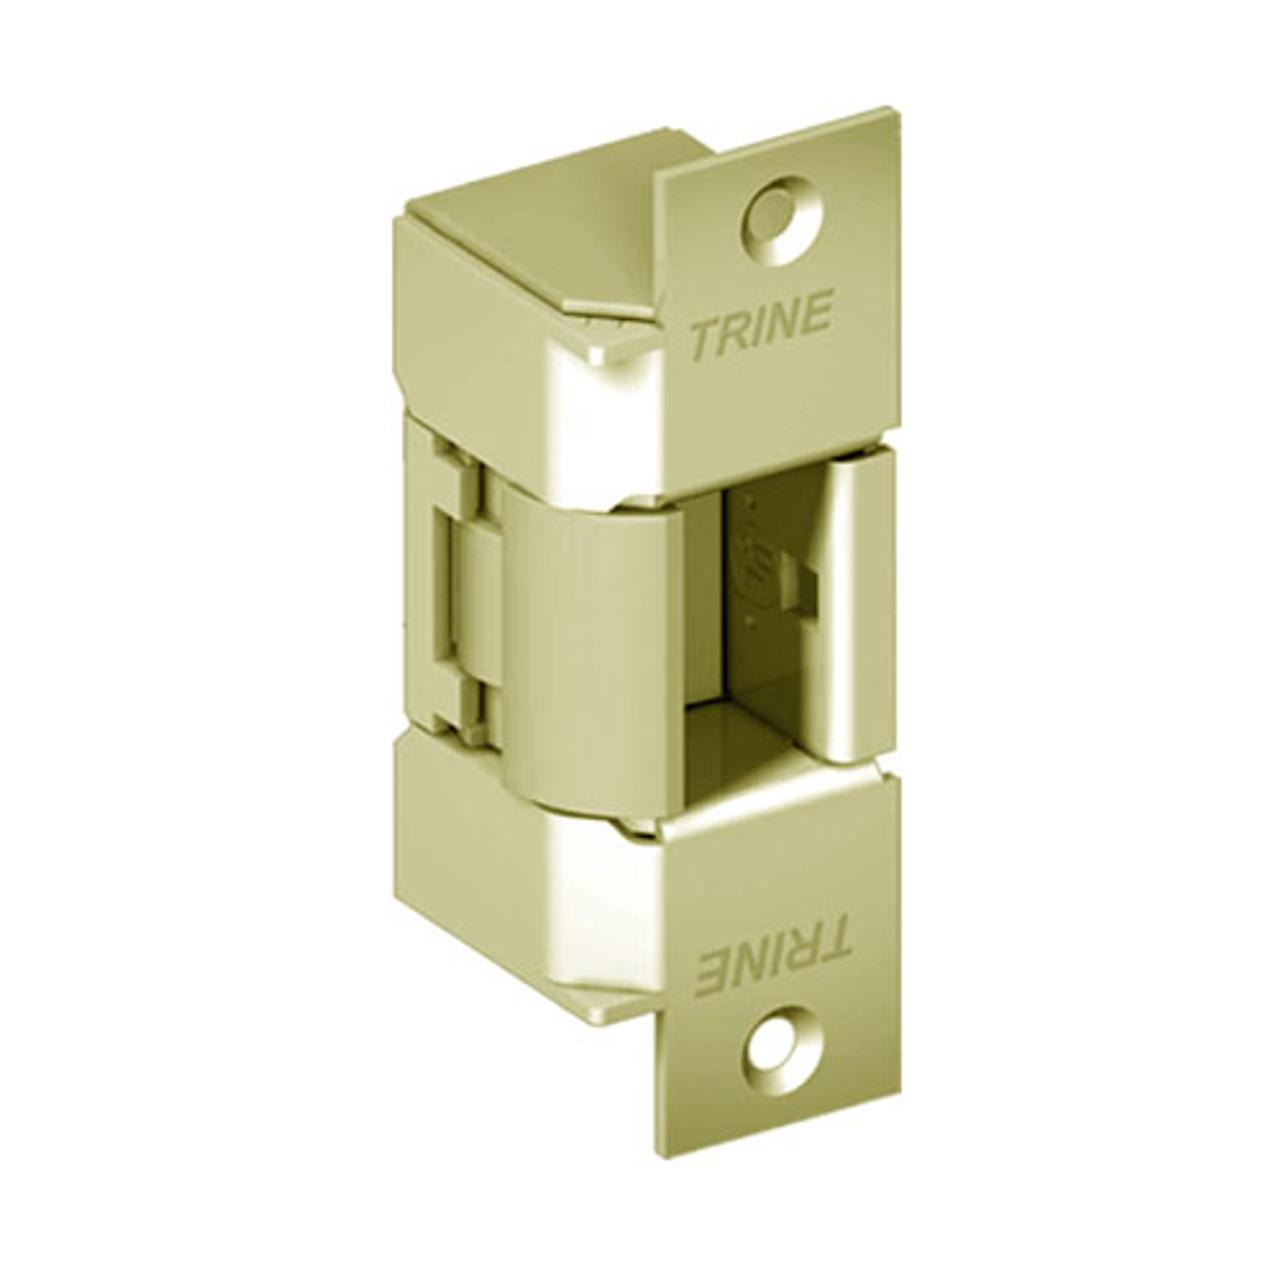 EN400-24DC-US4-LH Trine EN Series Outdoor Electric Strikes Solution in Satin Brass Finish